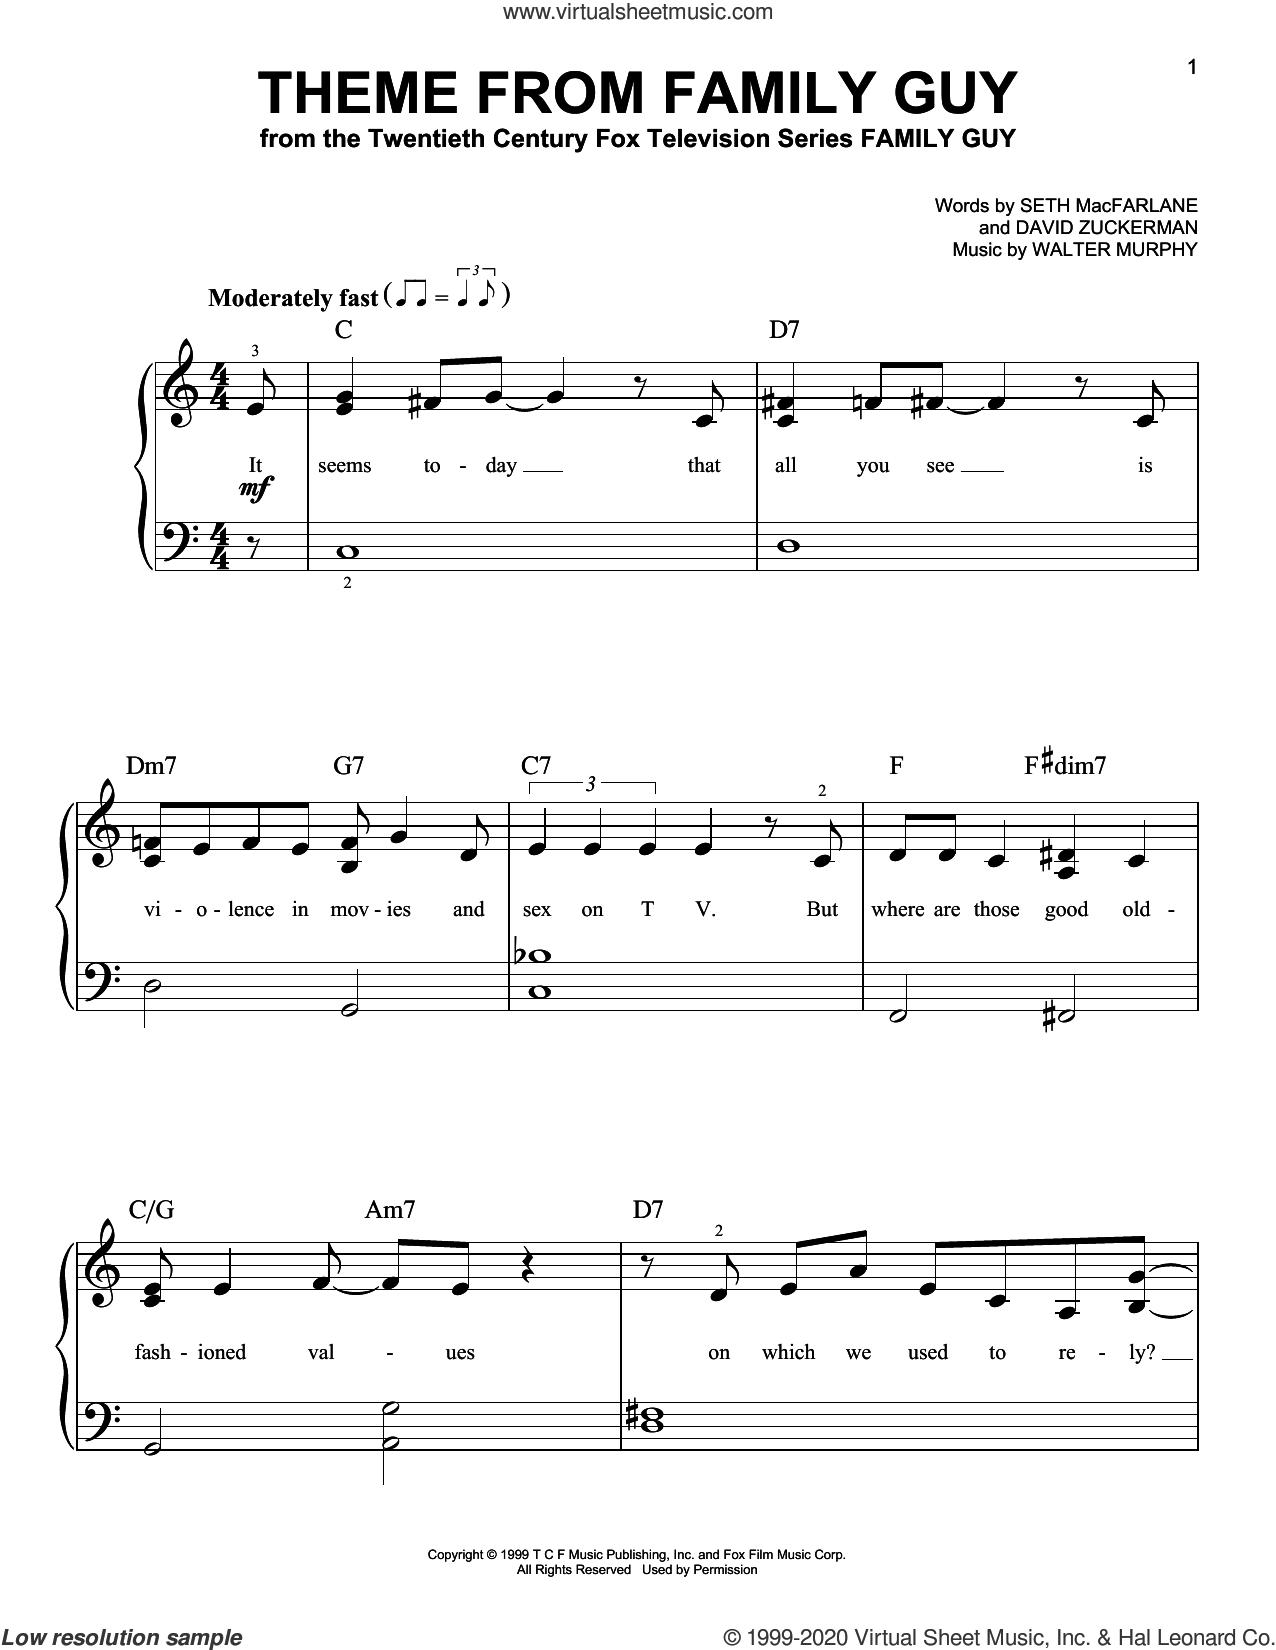 Theme From Family Guy sheet music for piano solo by Walter Murphy, David Zuckerman and Seth MacFarlane, beginner skill level